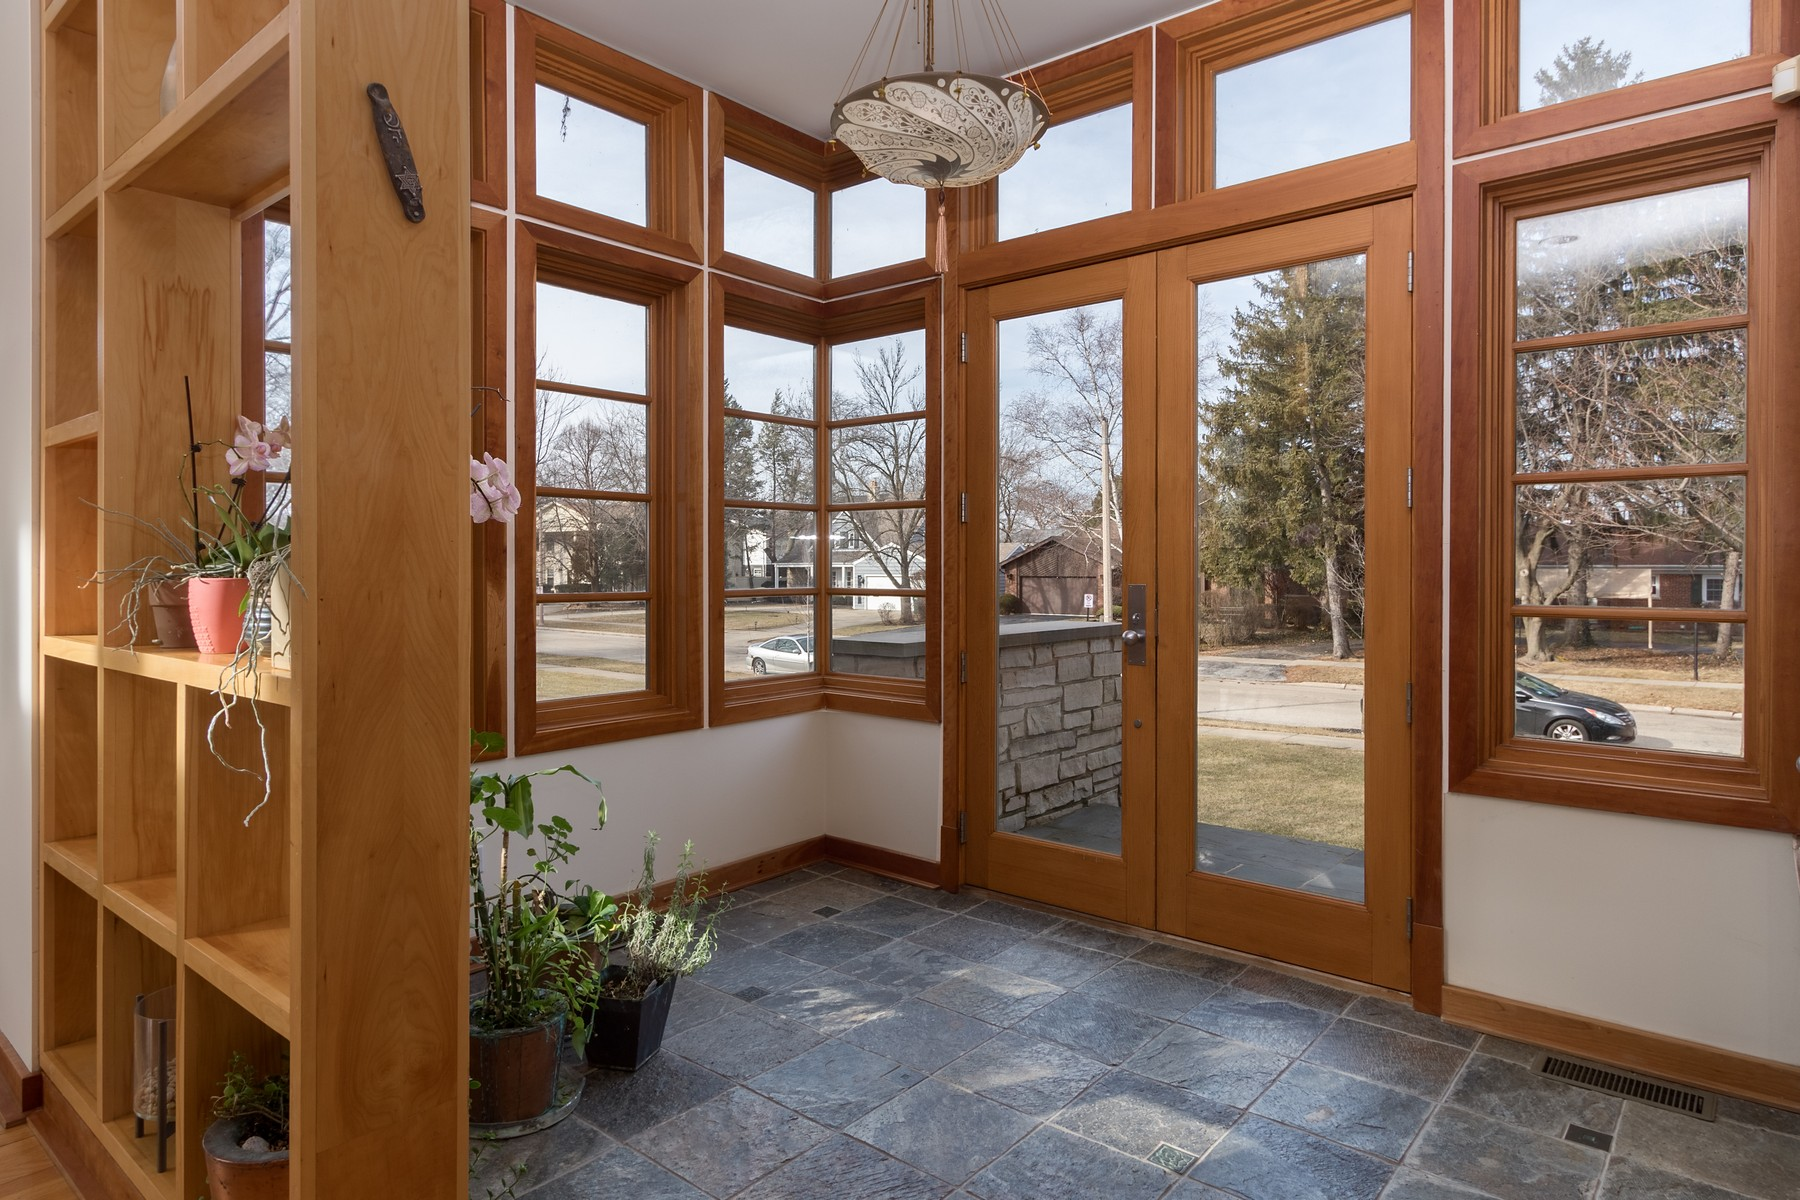 獨棟家庭住宅 為 出售 在 One of a Kind, Contemporary Wilmette Home 3221 Wilmette Avenue Wilmette, 伊利諾斯州, 60091 美國